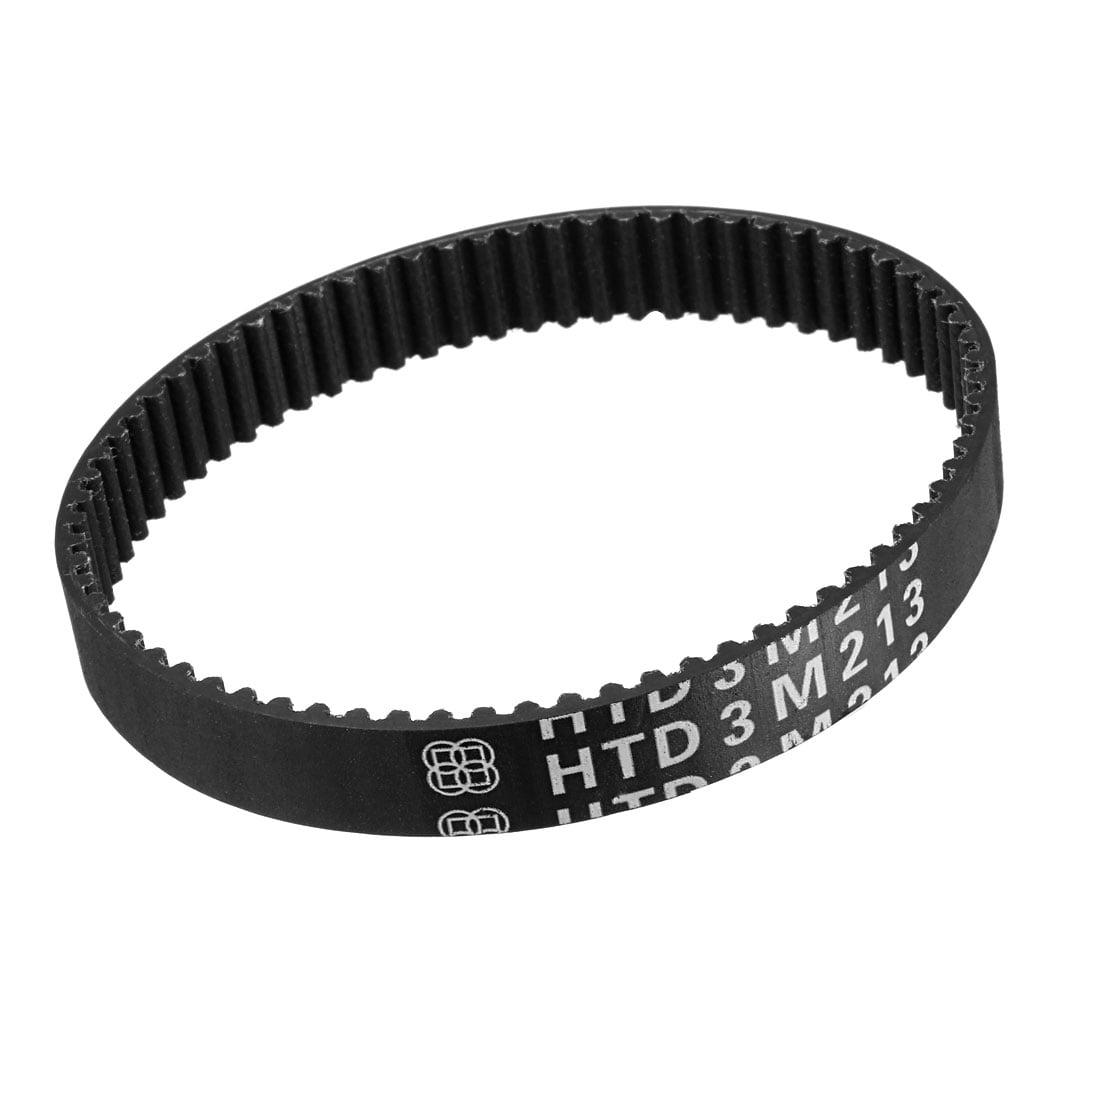 Unique Bargains HTD3M 71 Teeth Engine Timing Belt Rubber Geared-Belt 213mm Girth 10mm Width - image 2 of 2